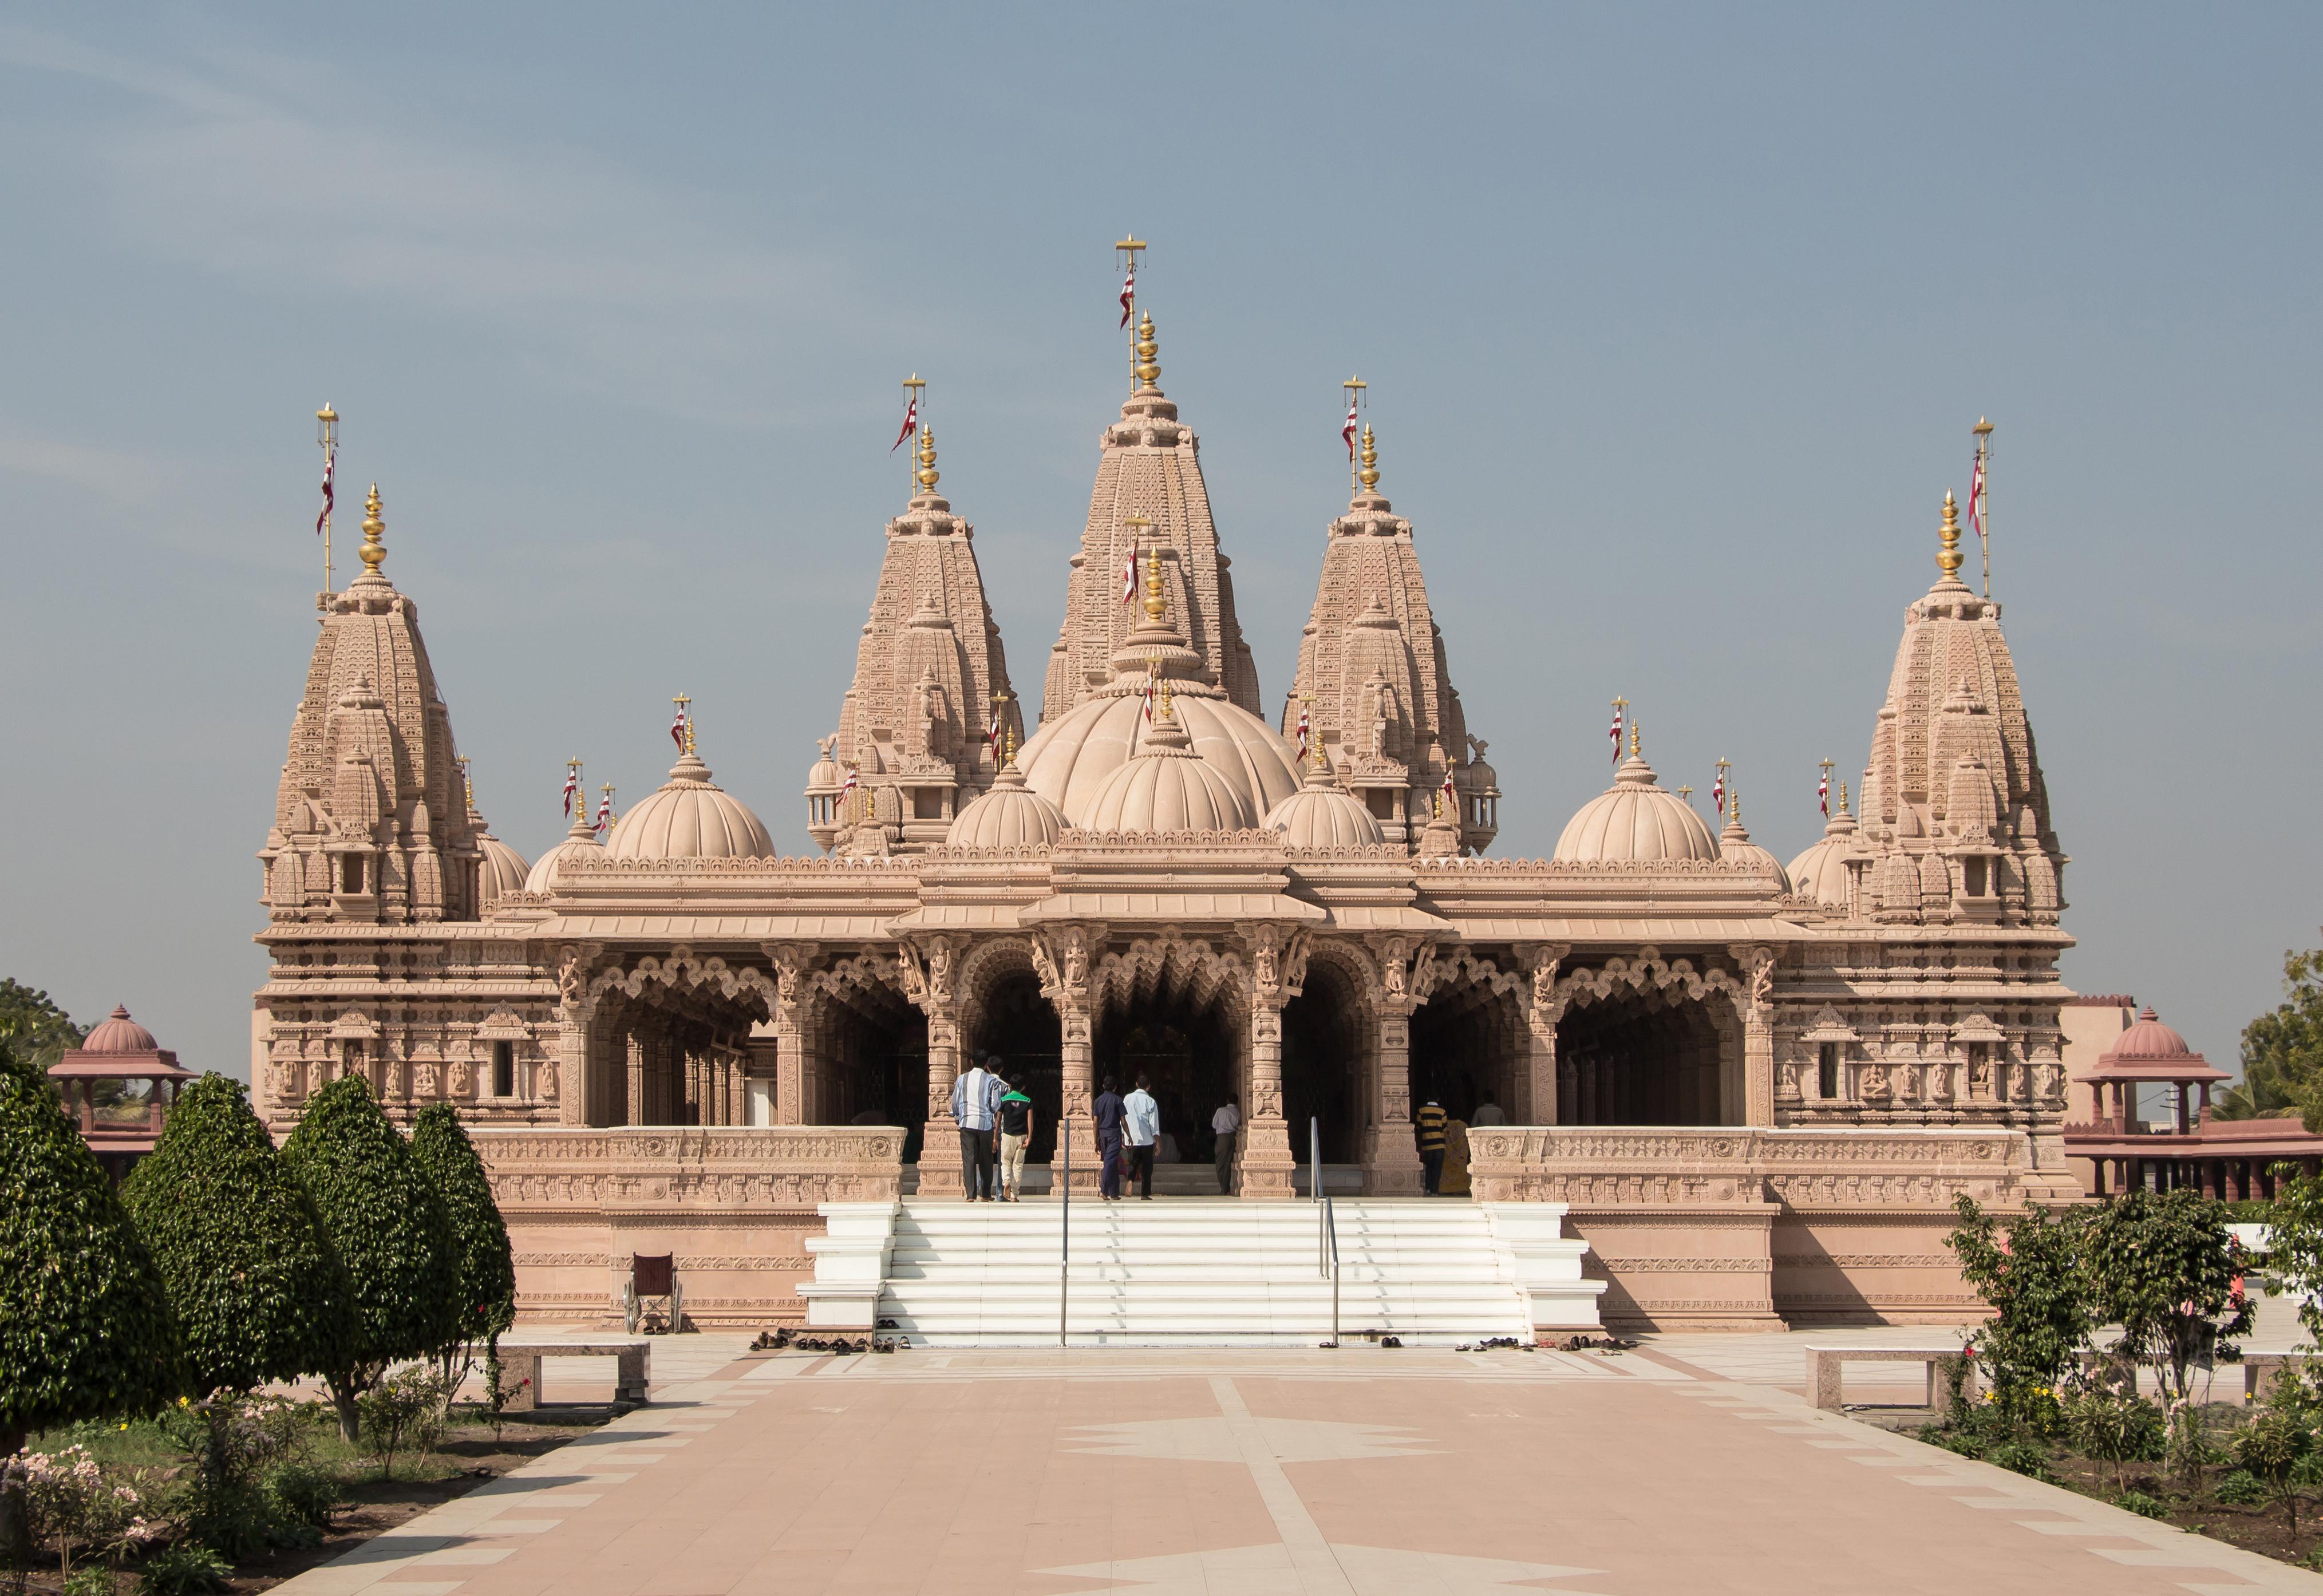 File:Shri Swaminarayan Mandir, Bhavnagar 01.jpg - Wikipedia